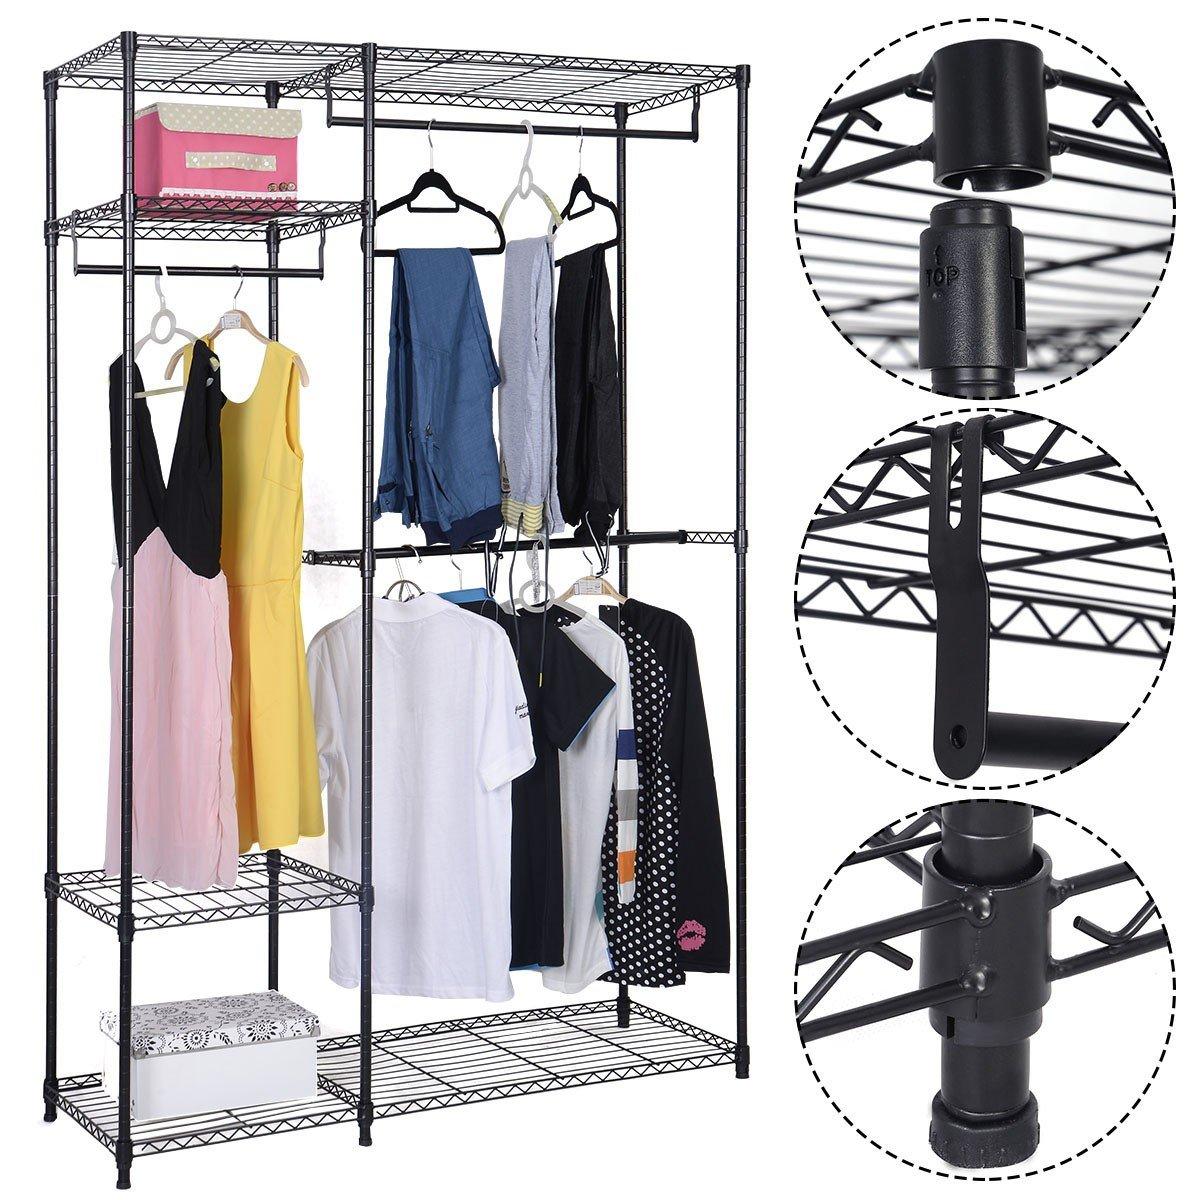 48''x18''x71'' Portable Closet Hanger Storage Rack Organizer - By Choice Products